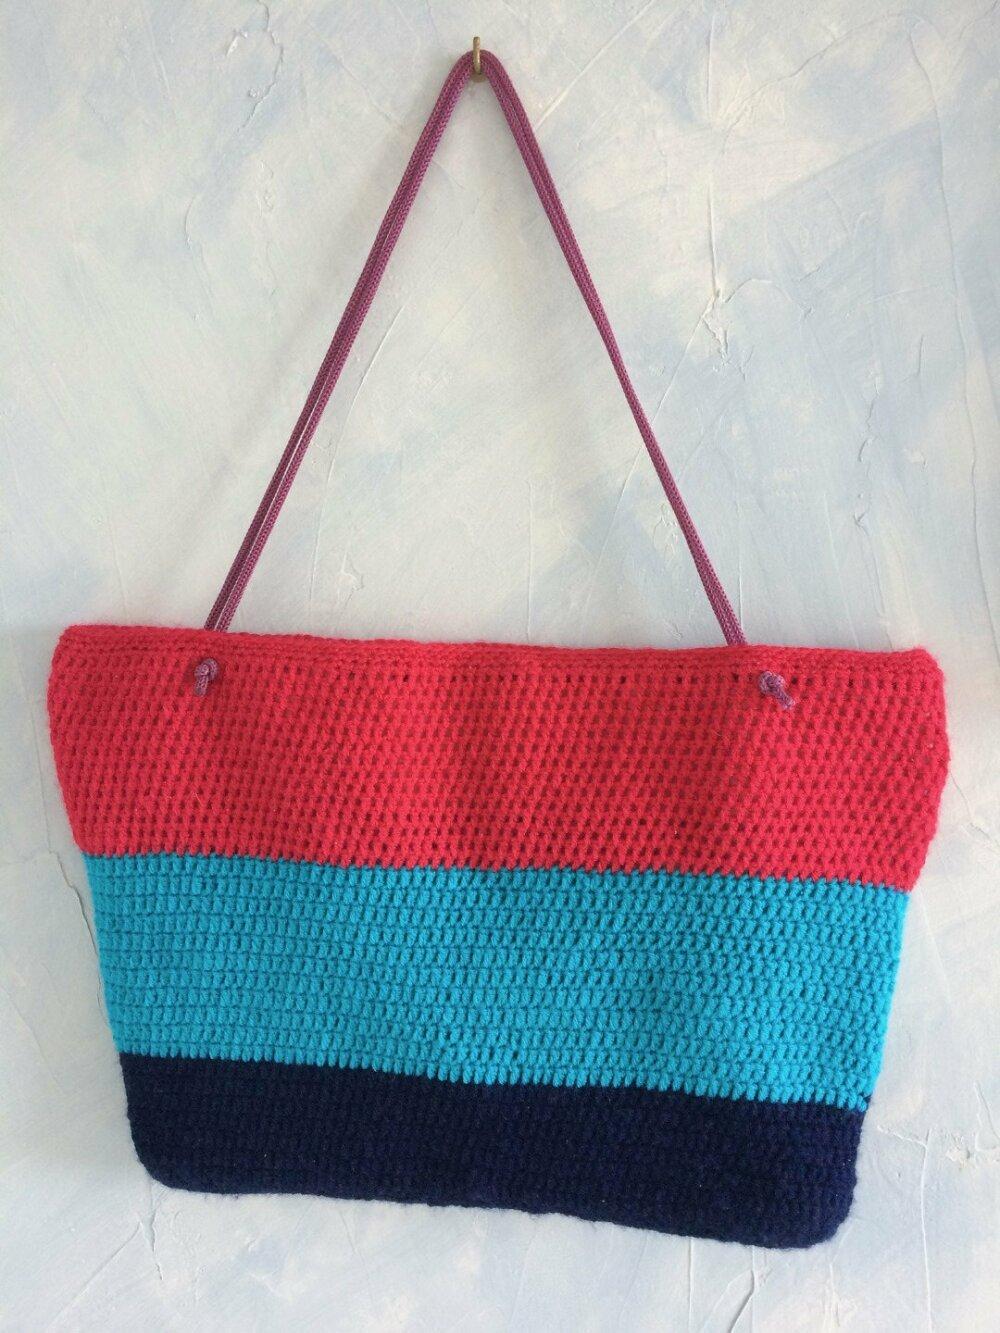 Joli sac à bandoulières